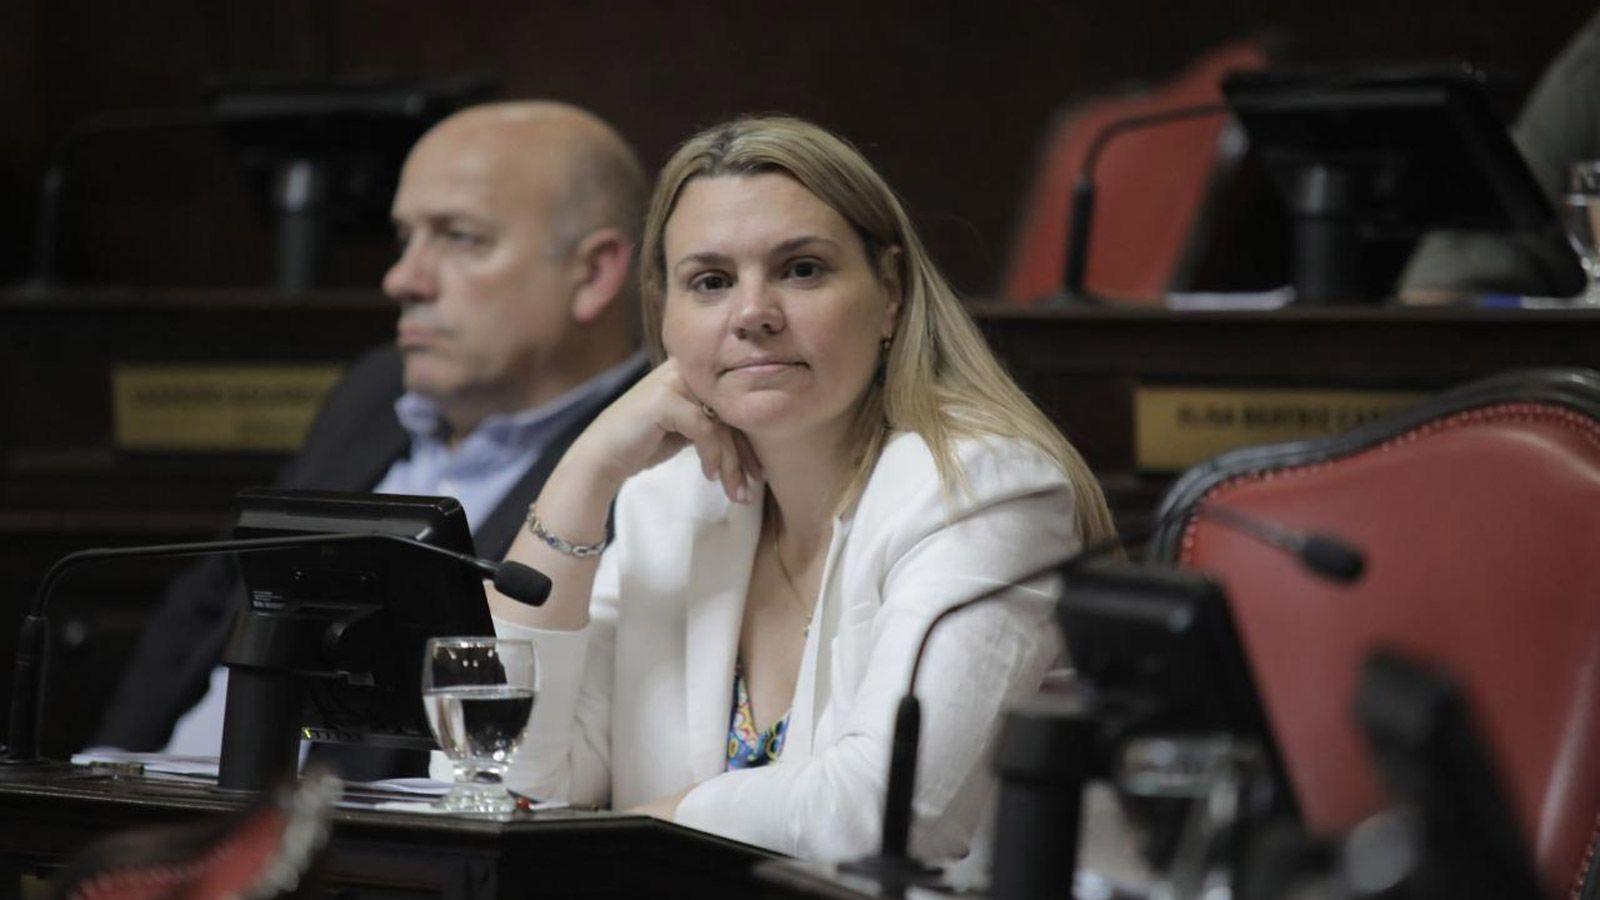 La senadora del PRO, Lorena Petrovich